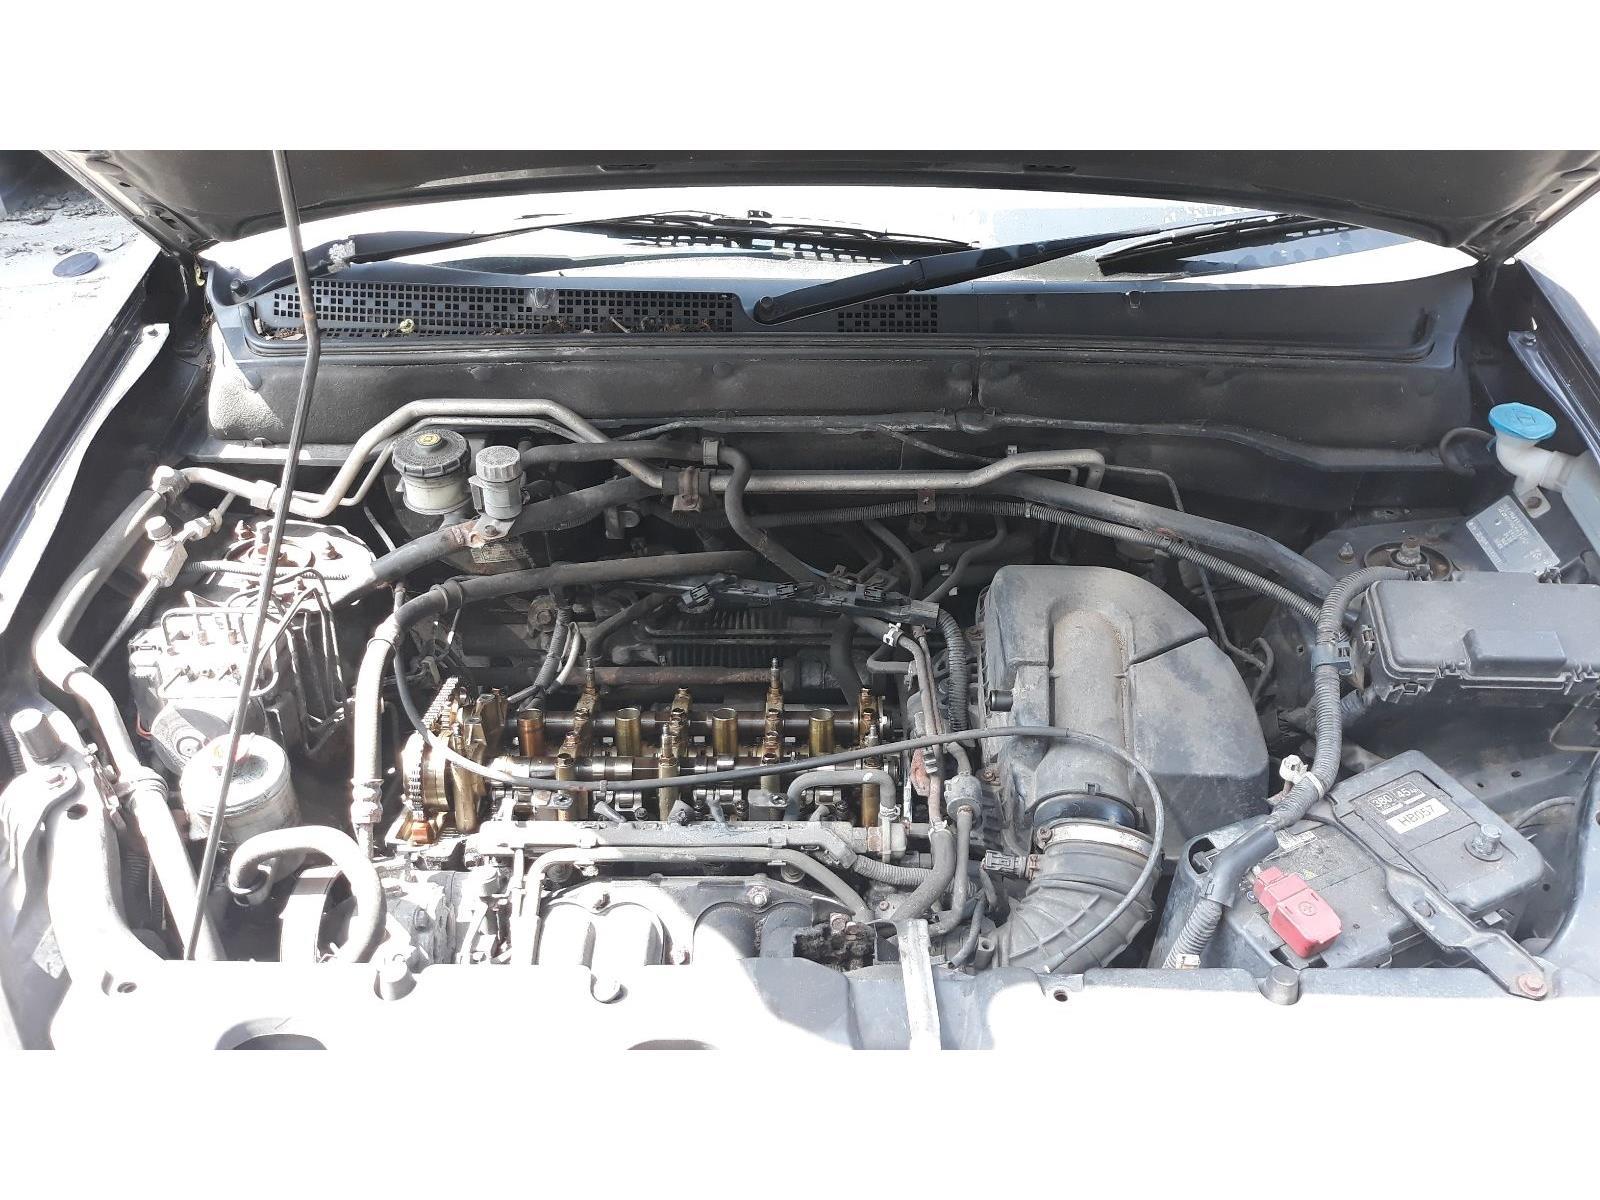 Honda Cr V 2002 To 2003 Se Sport 5 Door Estate Scrap Salvage Car Rear Suspension Parts Diagram 1997 Front For Sale Auction Silverlake Autoparts